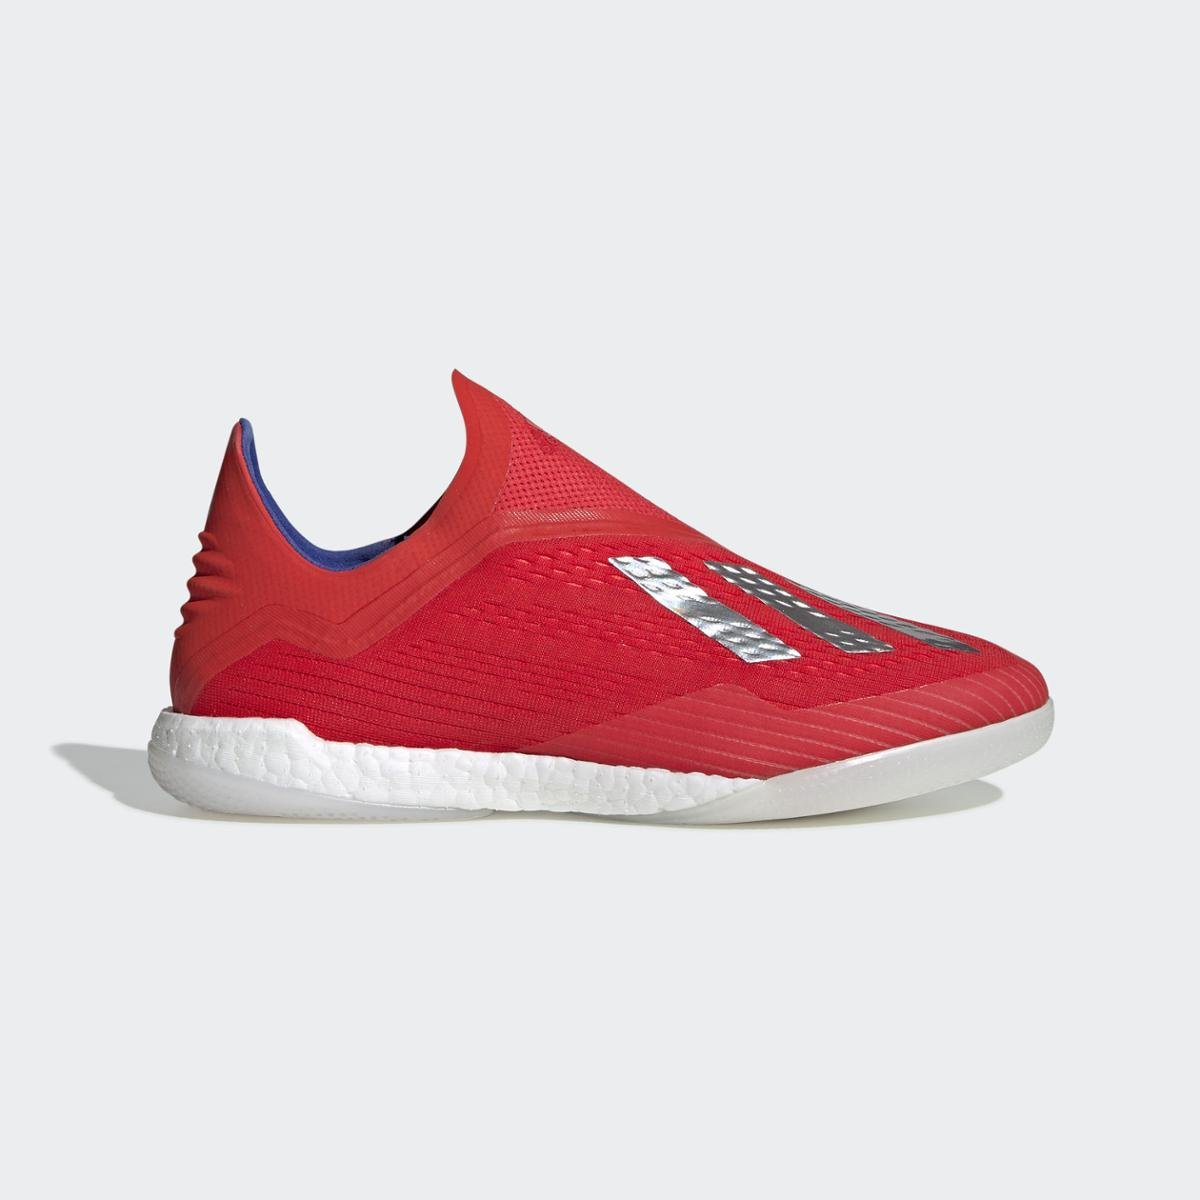 Chuteira Futsal Adidas X Tango 18+ - Vermelho